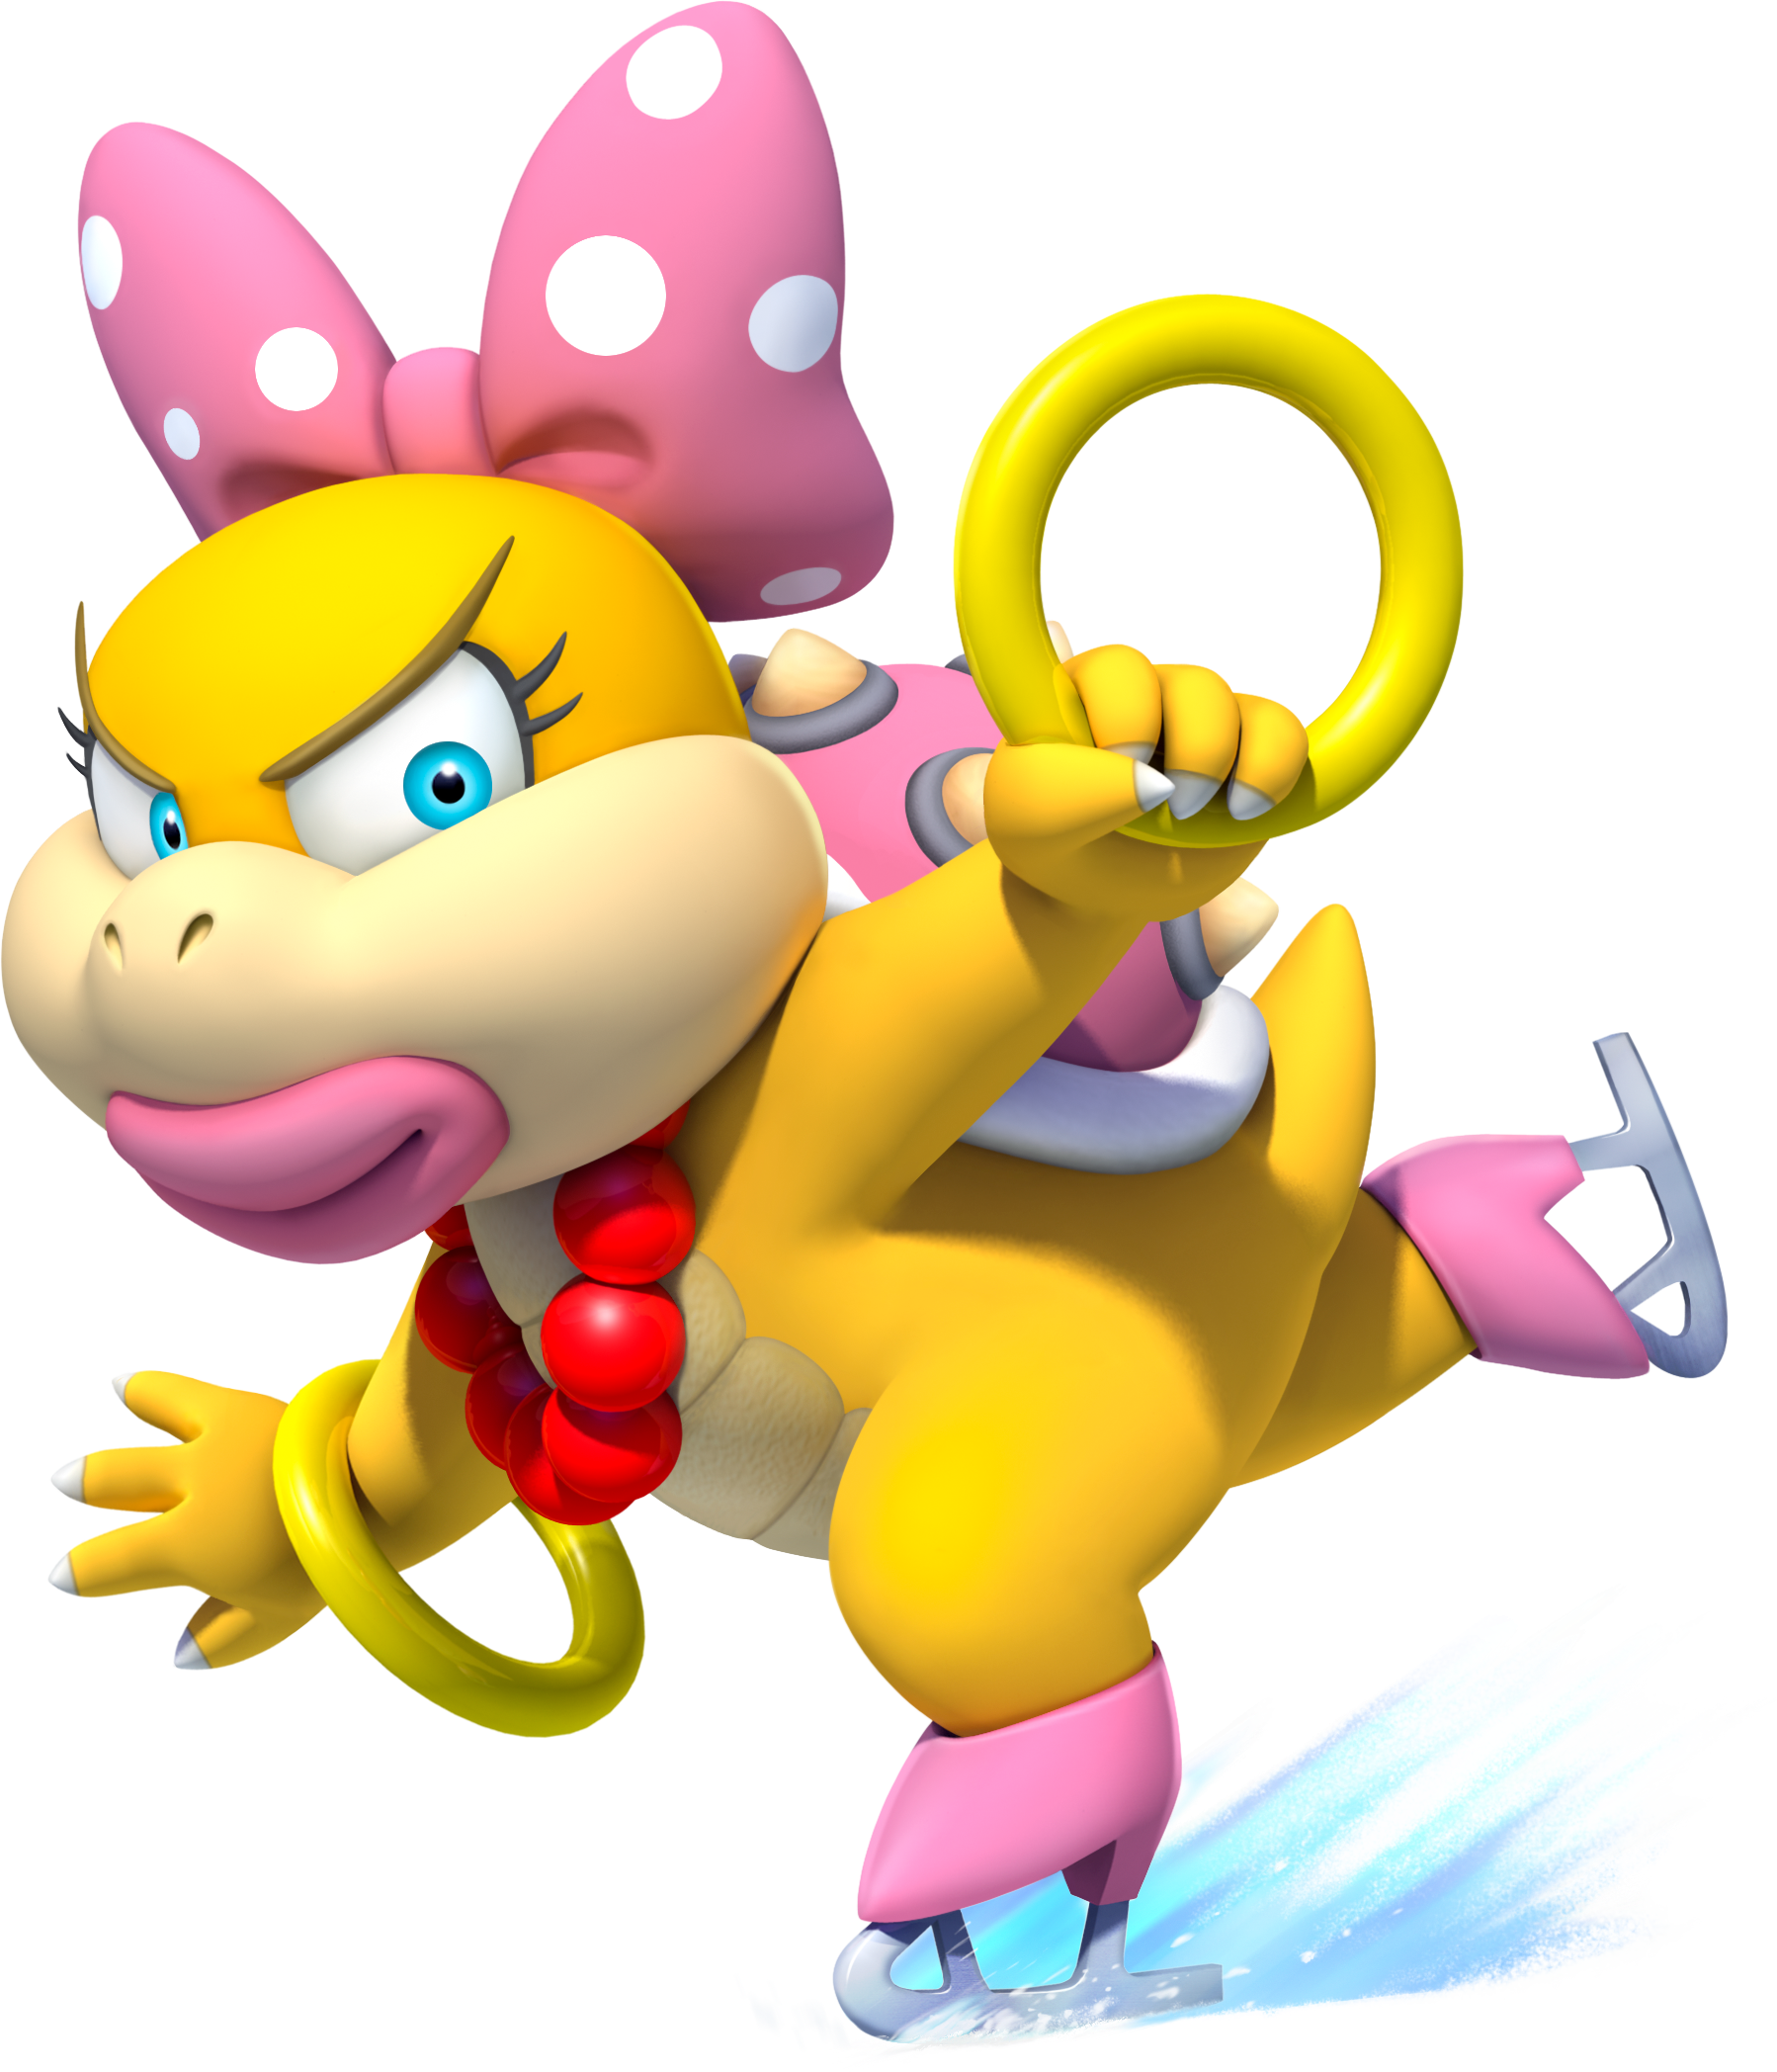 Wendy O Koopa Mariowiki Fandom Powered By Wikia